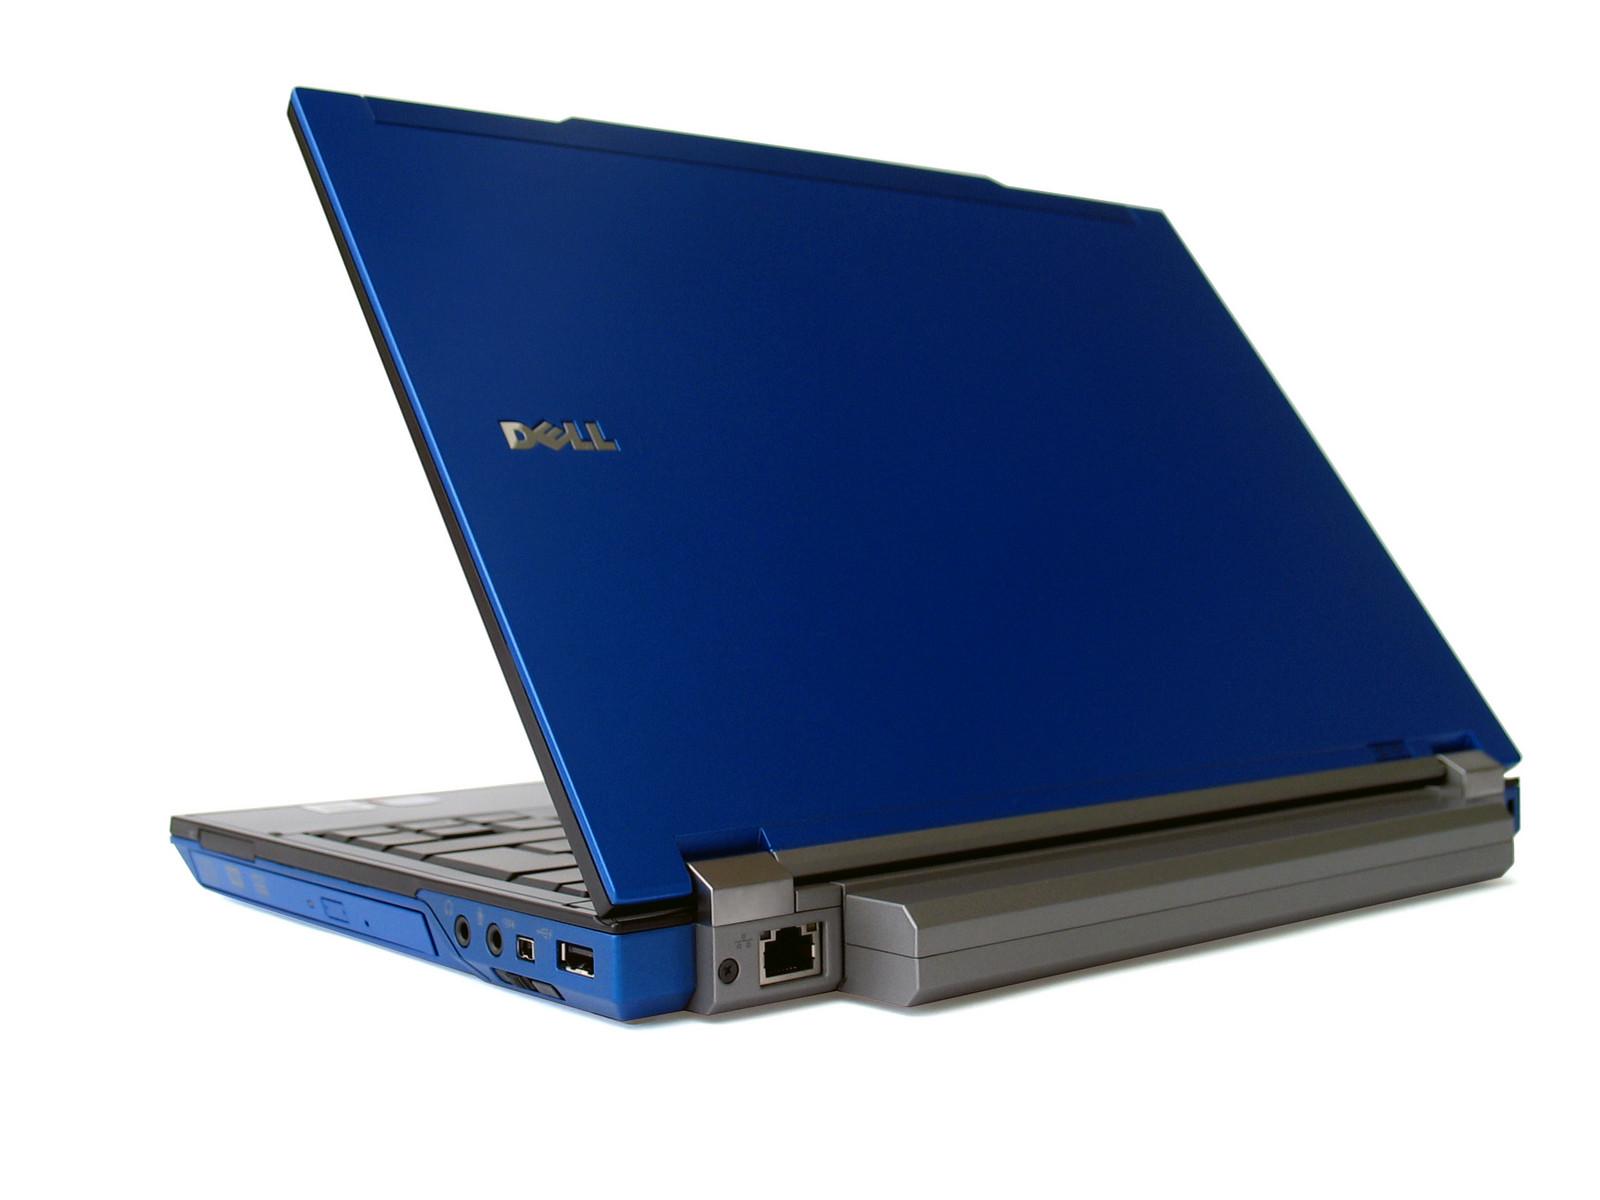 Dell Latitude E4300 - Notebookcheck.net External Reviews